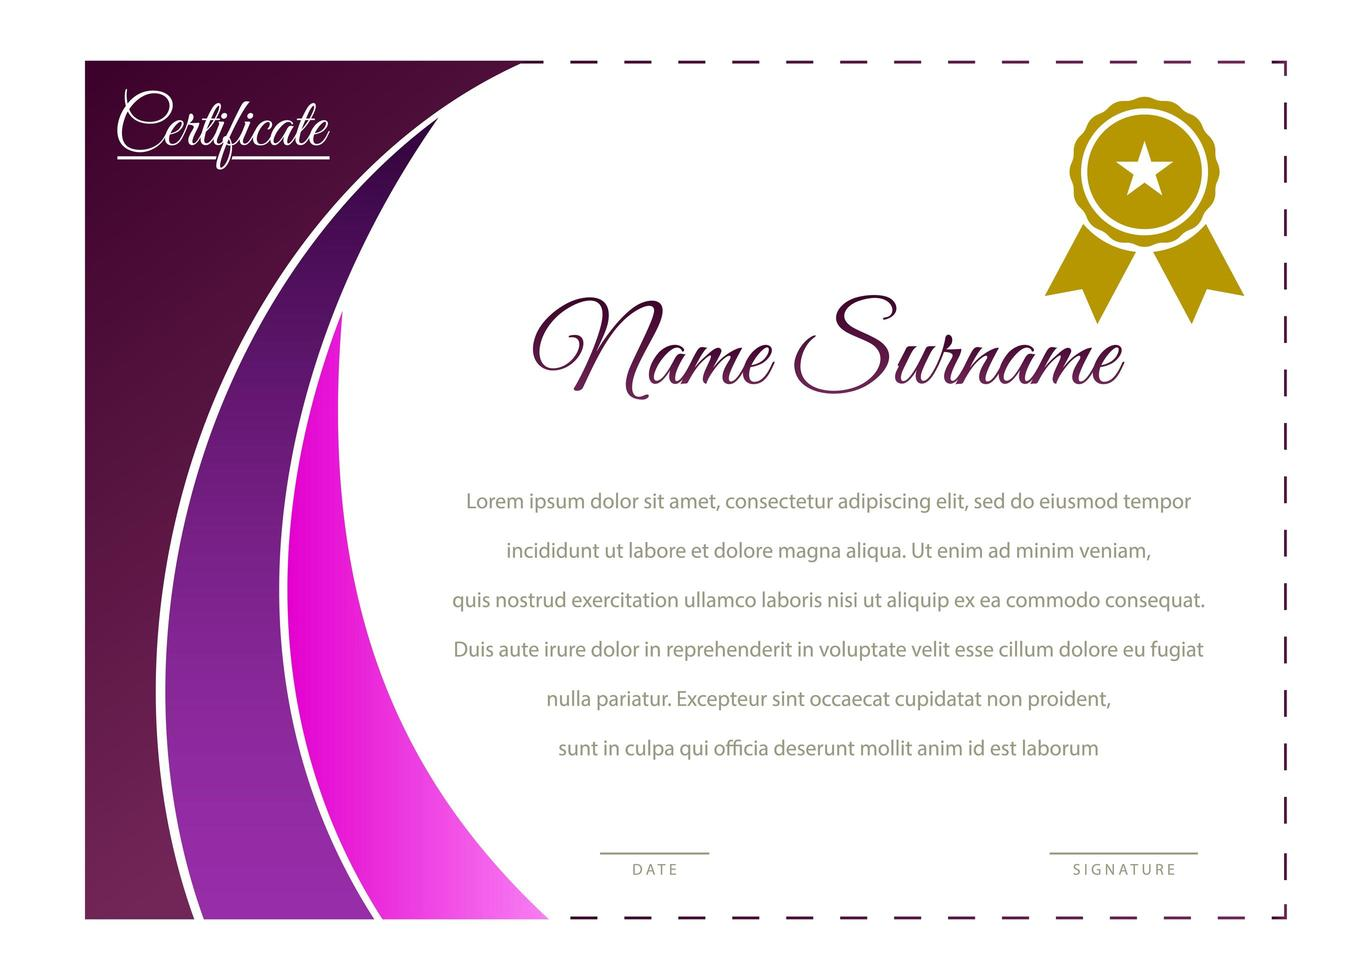 modelo de certificado horizontal de canto curvo gradiente rosa roxo vetor